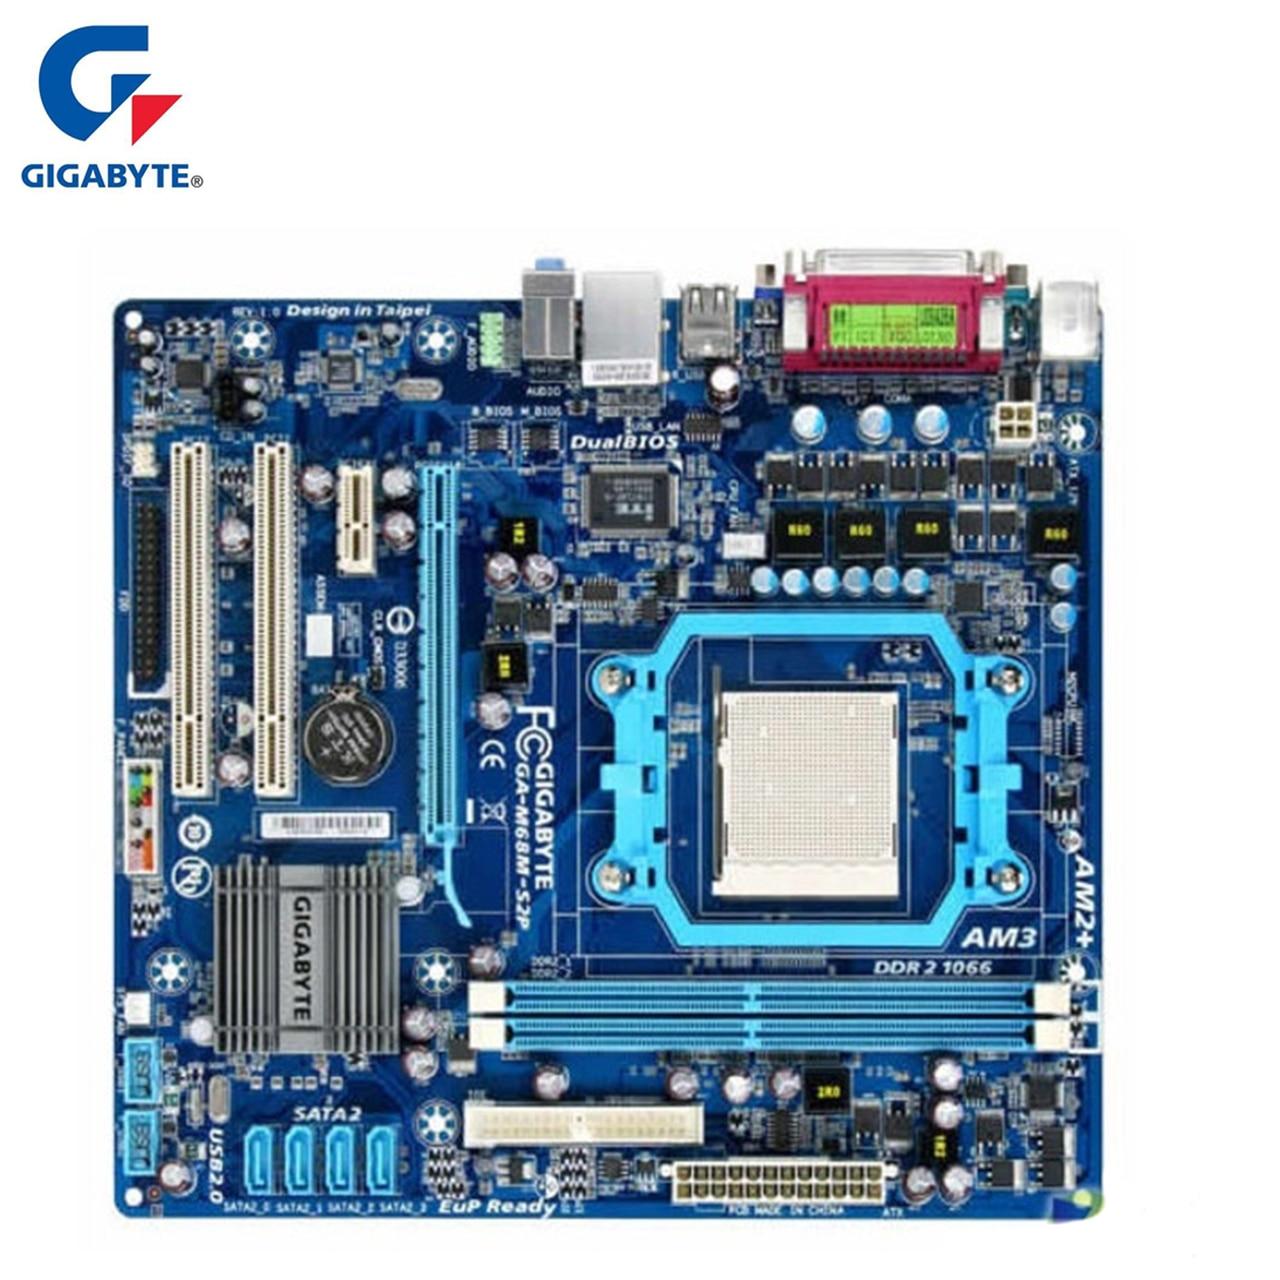 Gigabyte GA-M68M-S2P placa base DDR2 8 GB hembra AM2/AM2 +/AM3 M68M S2P placa base de escritorio Systemboard se gráficos integrados